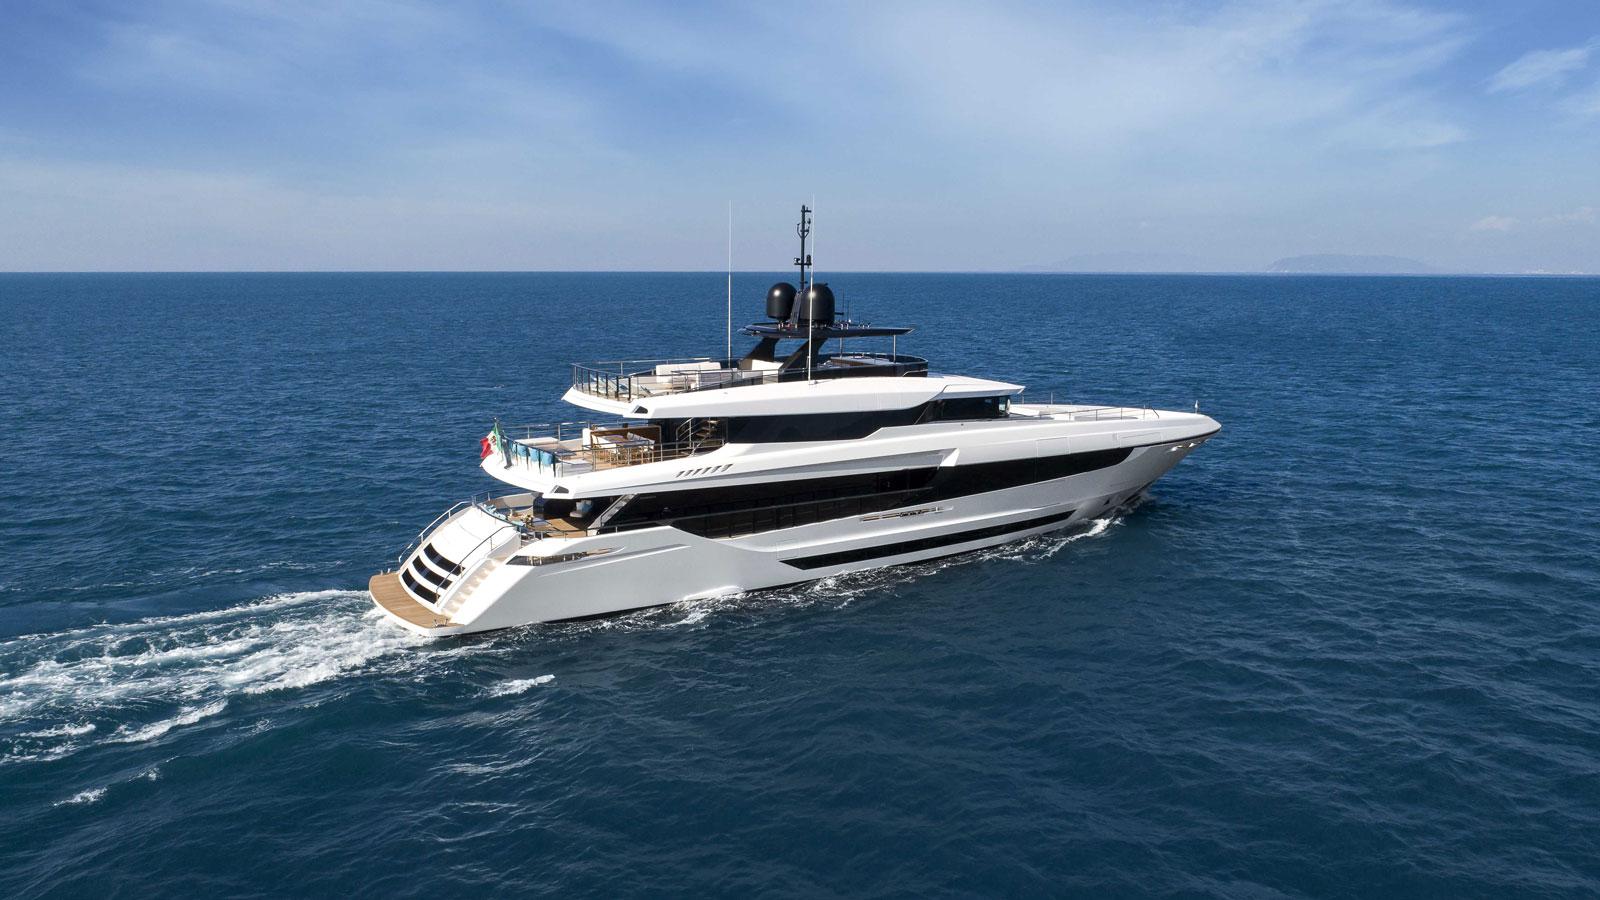 mangusta-oceano-motor-yacht-project-venezia-sold